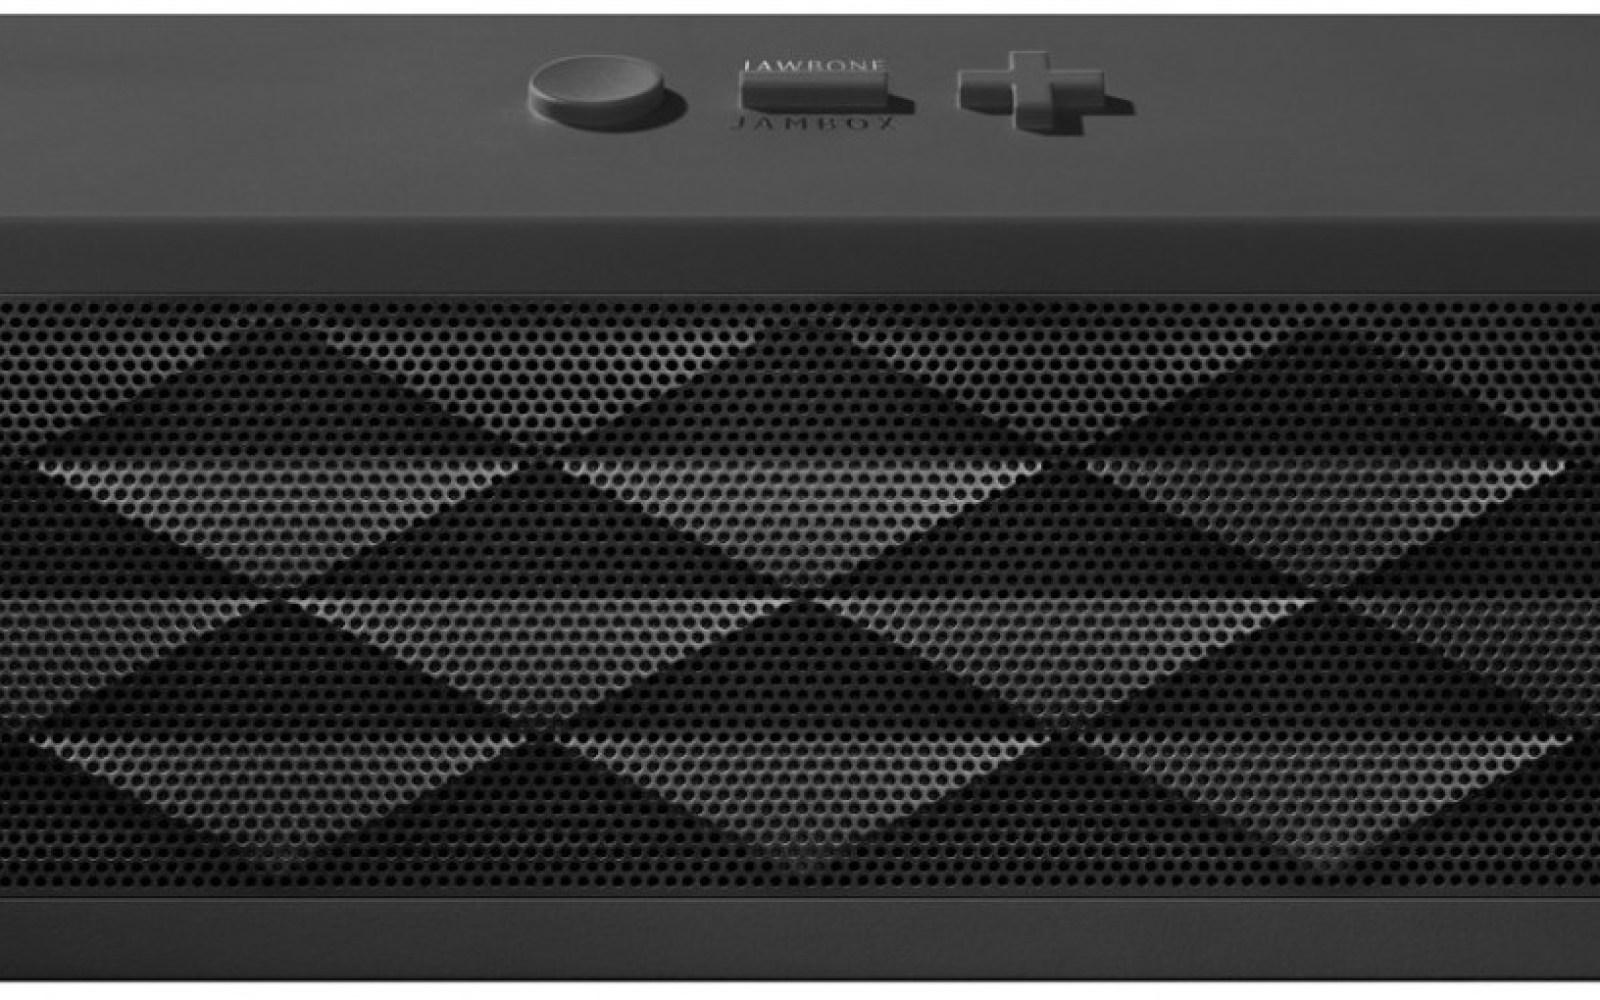 Jawbone Jambox Platinum in Black $95 + $5 Shipping